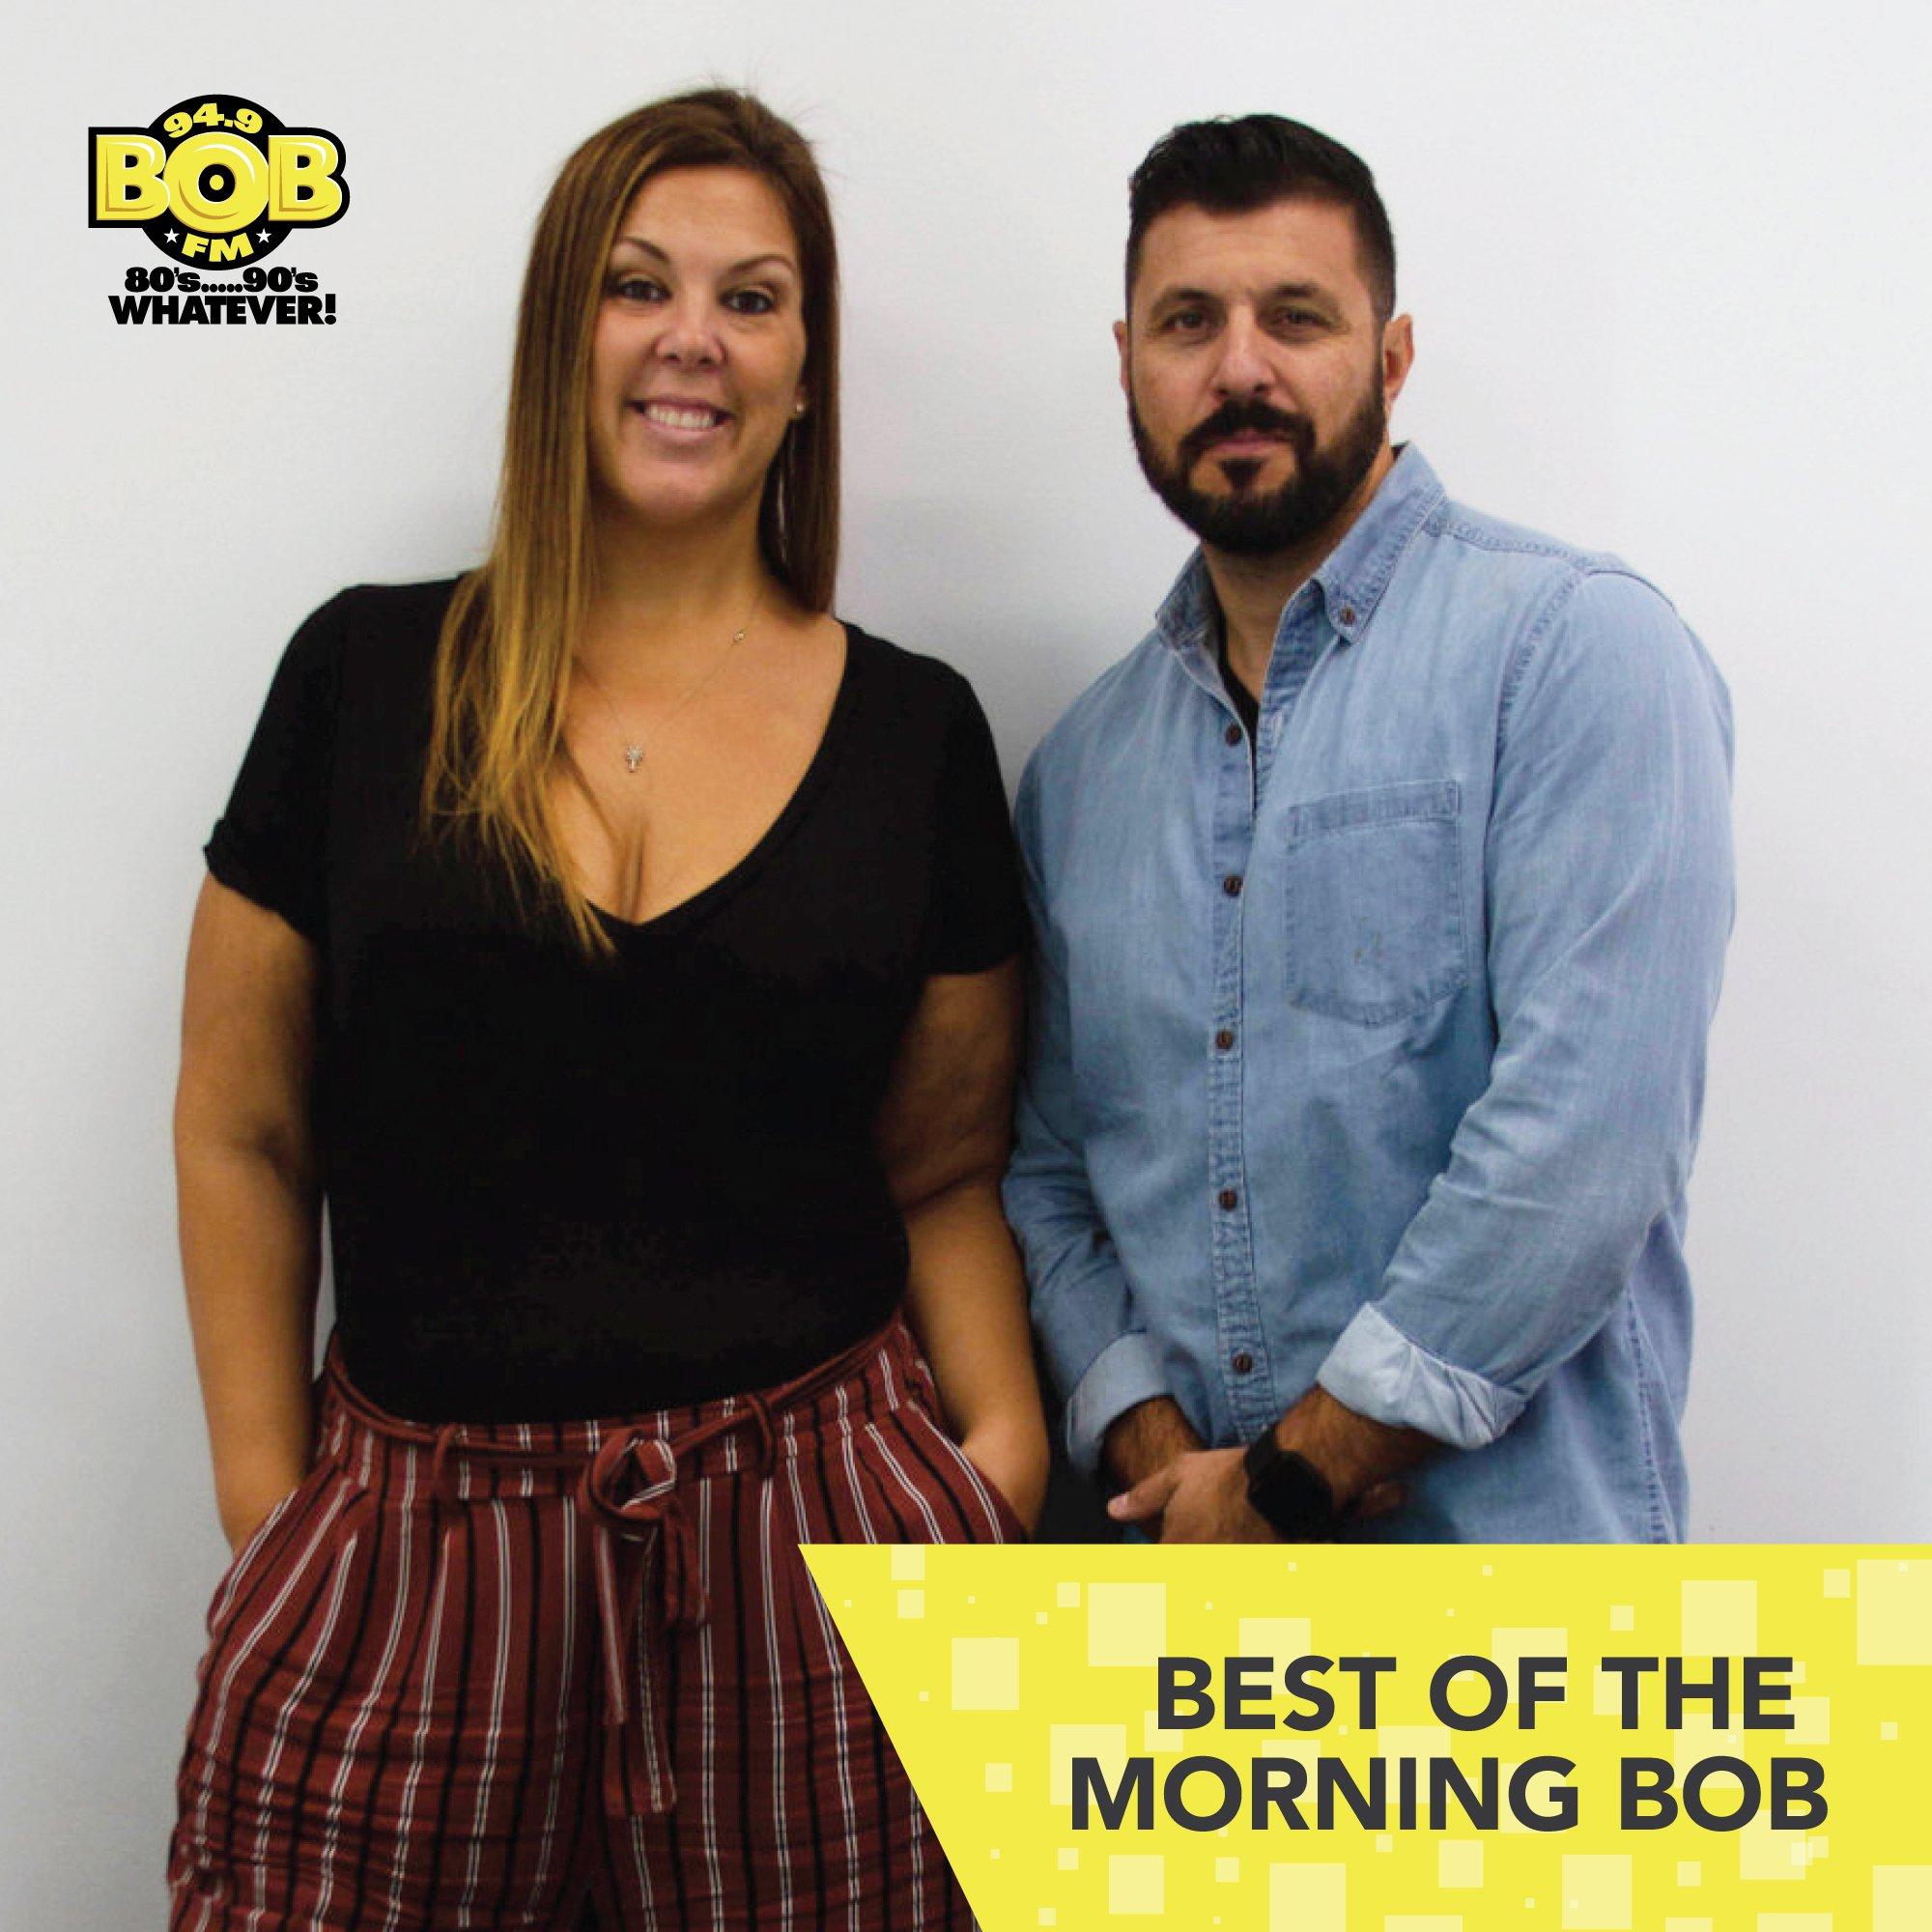 Best Of The Morning BOB | 94.9 BOB FM Grand Cayman